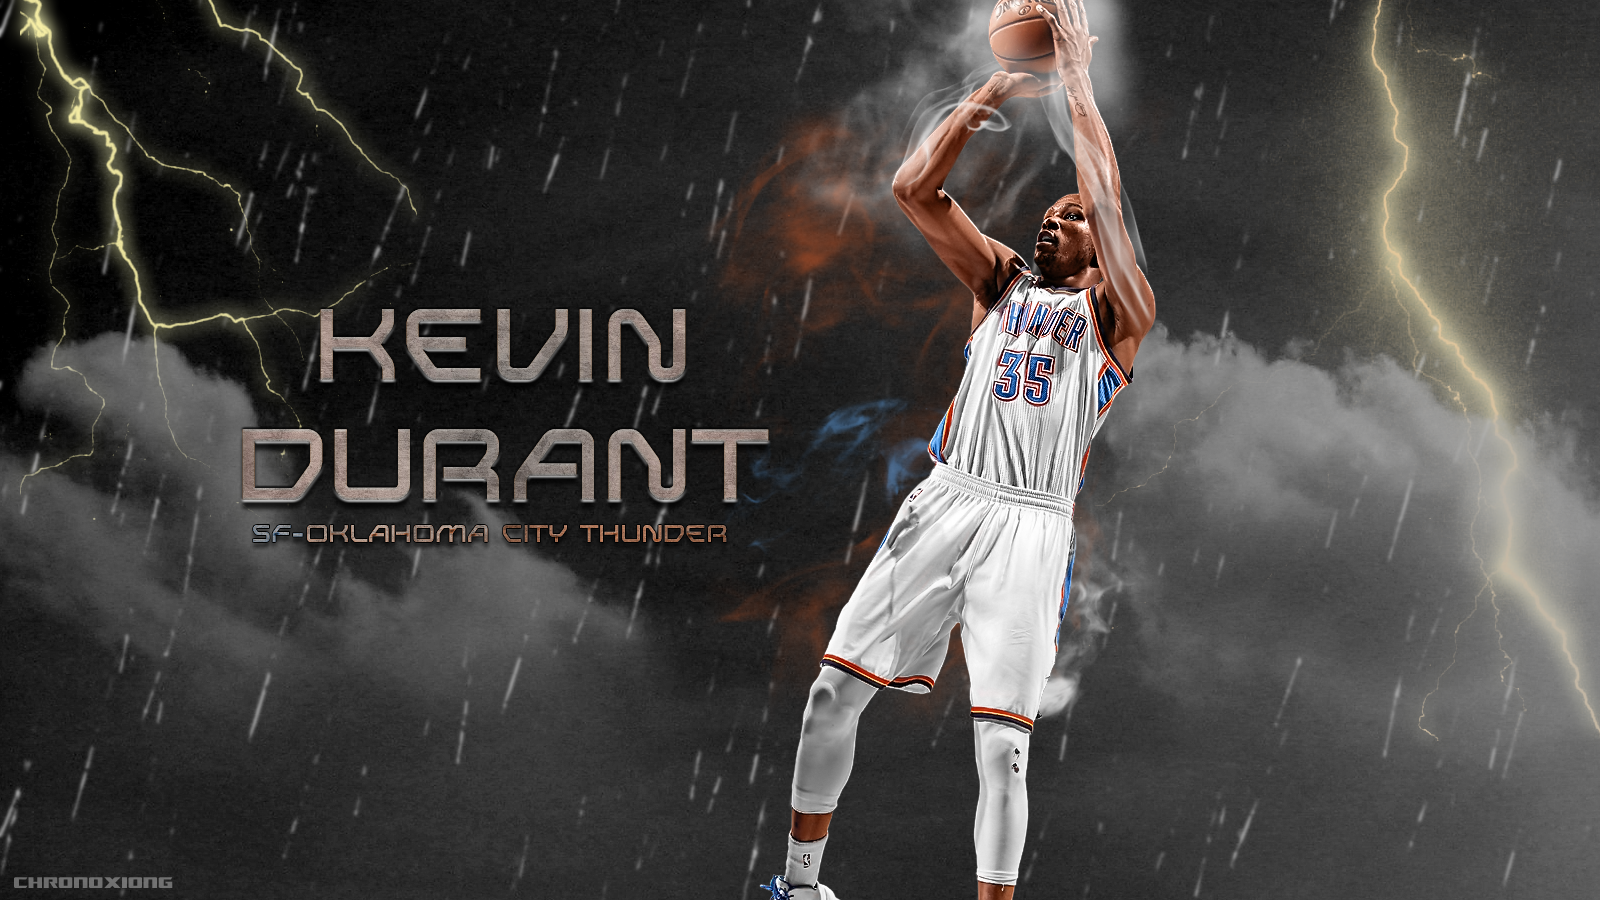 Kevin Durant Wallpaper HD Wallpaper Sports Wallpapers 1600x900